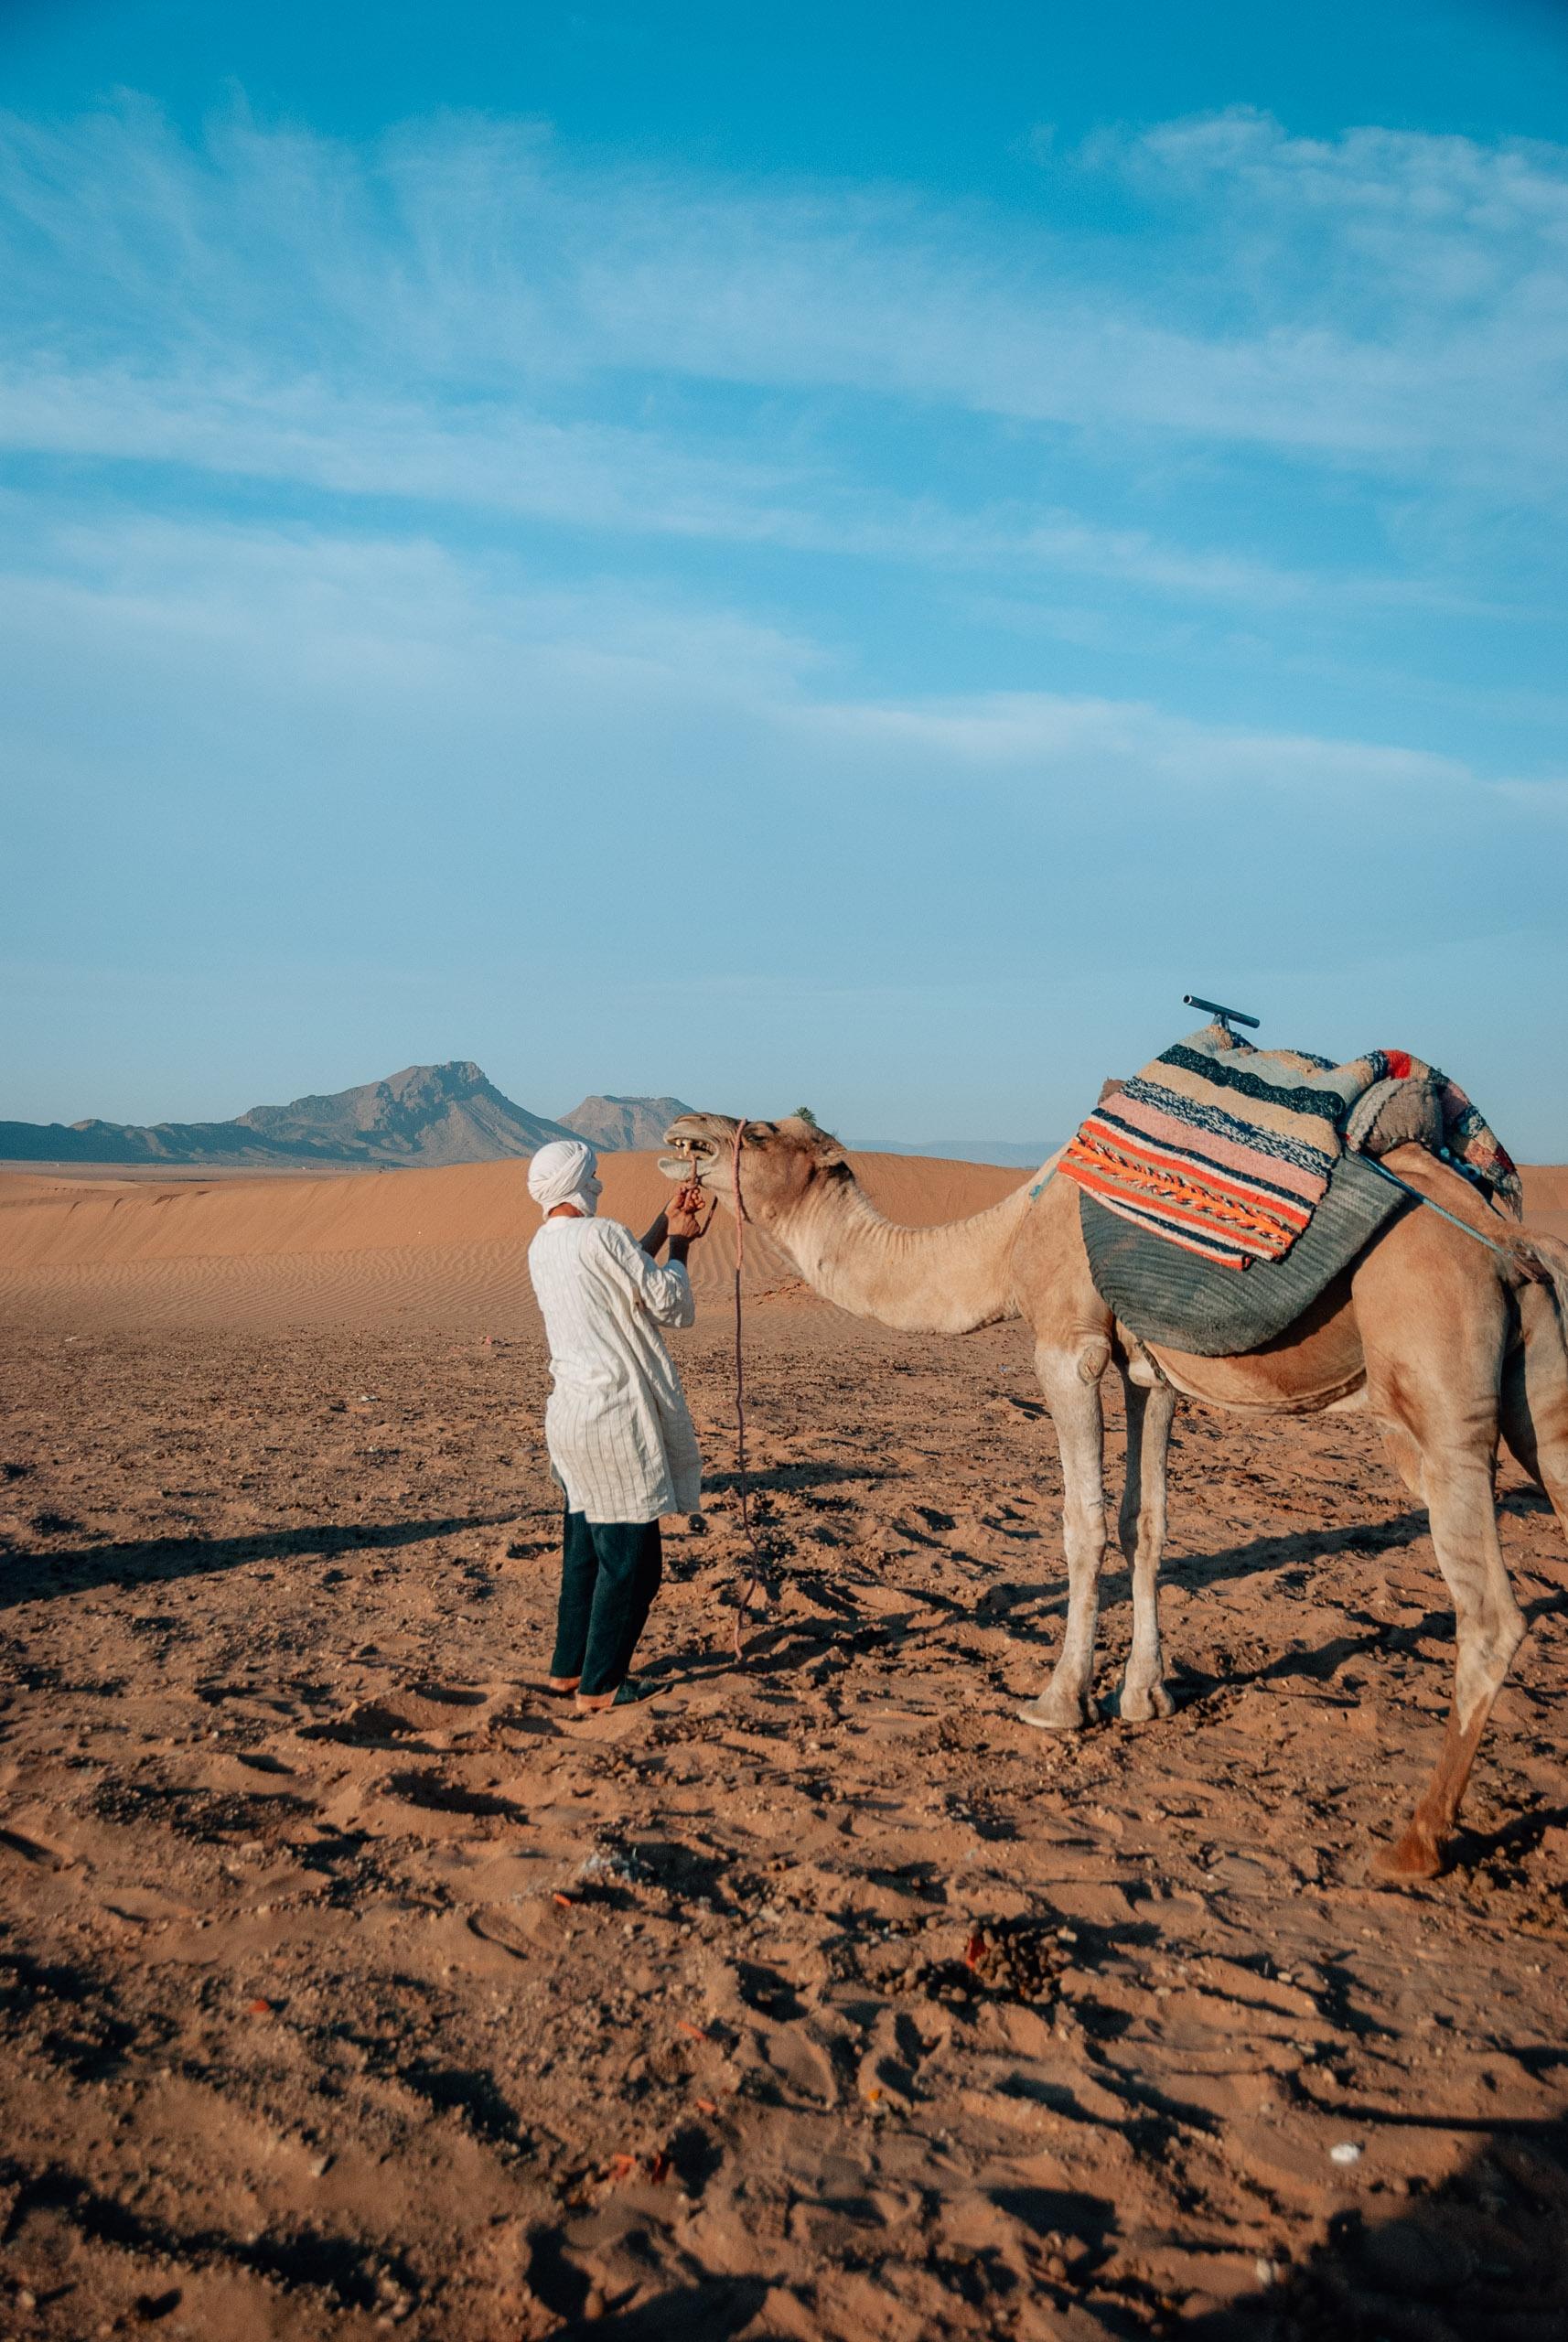 Morocco - 2008-0904-DSC_0260_111153